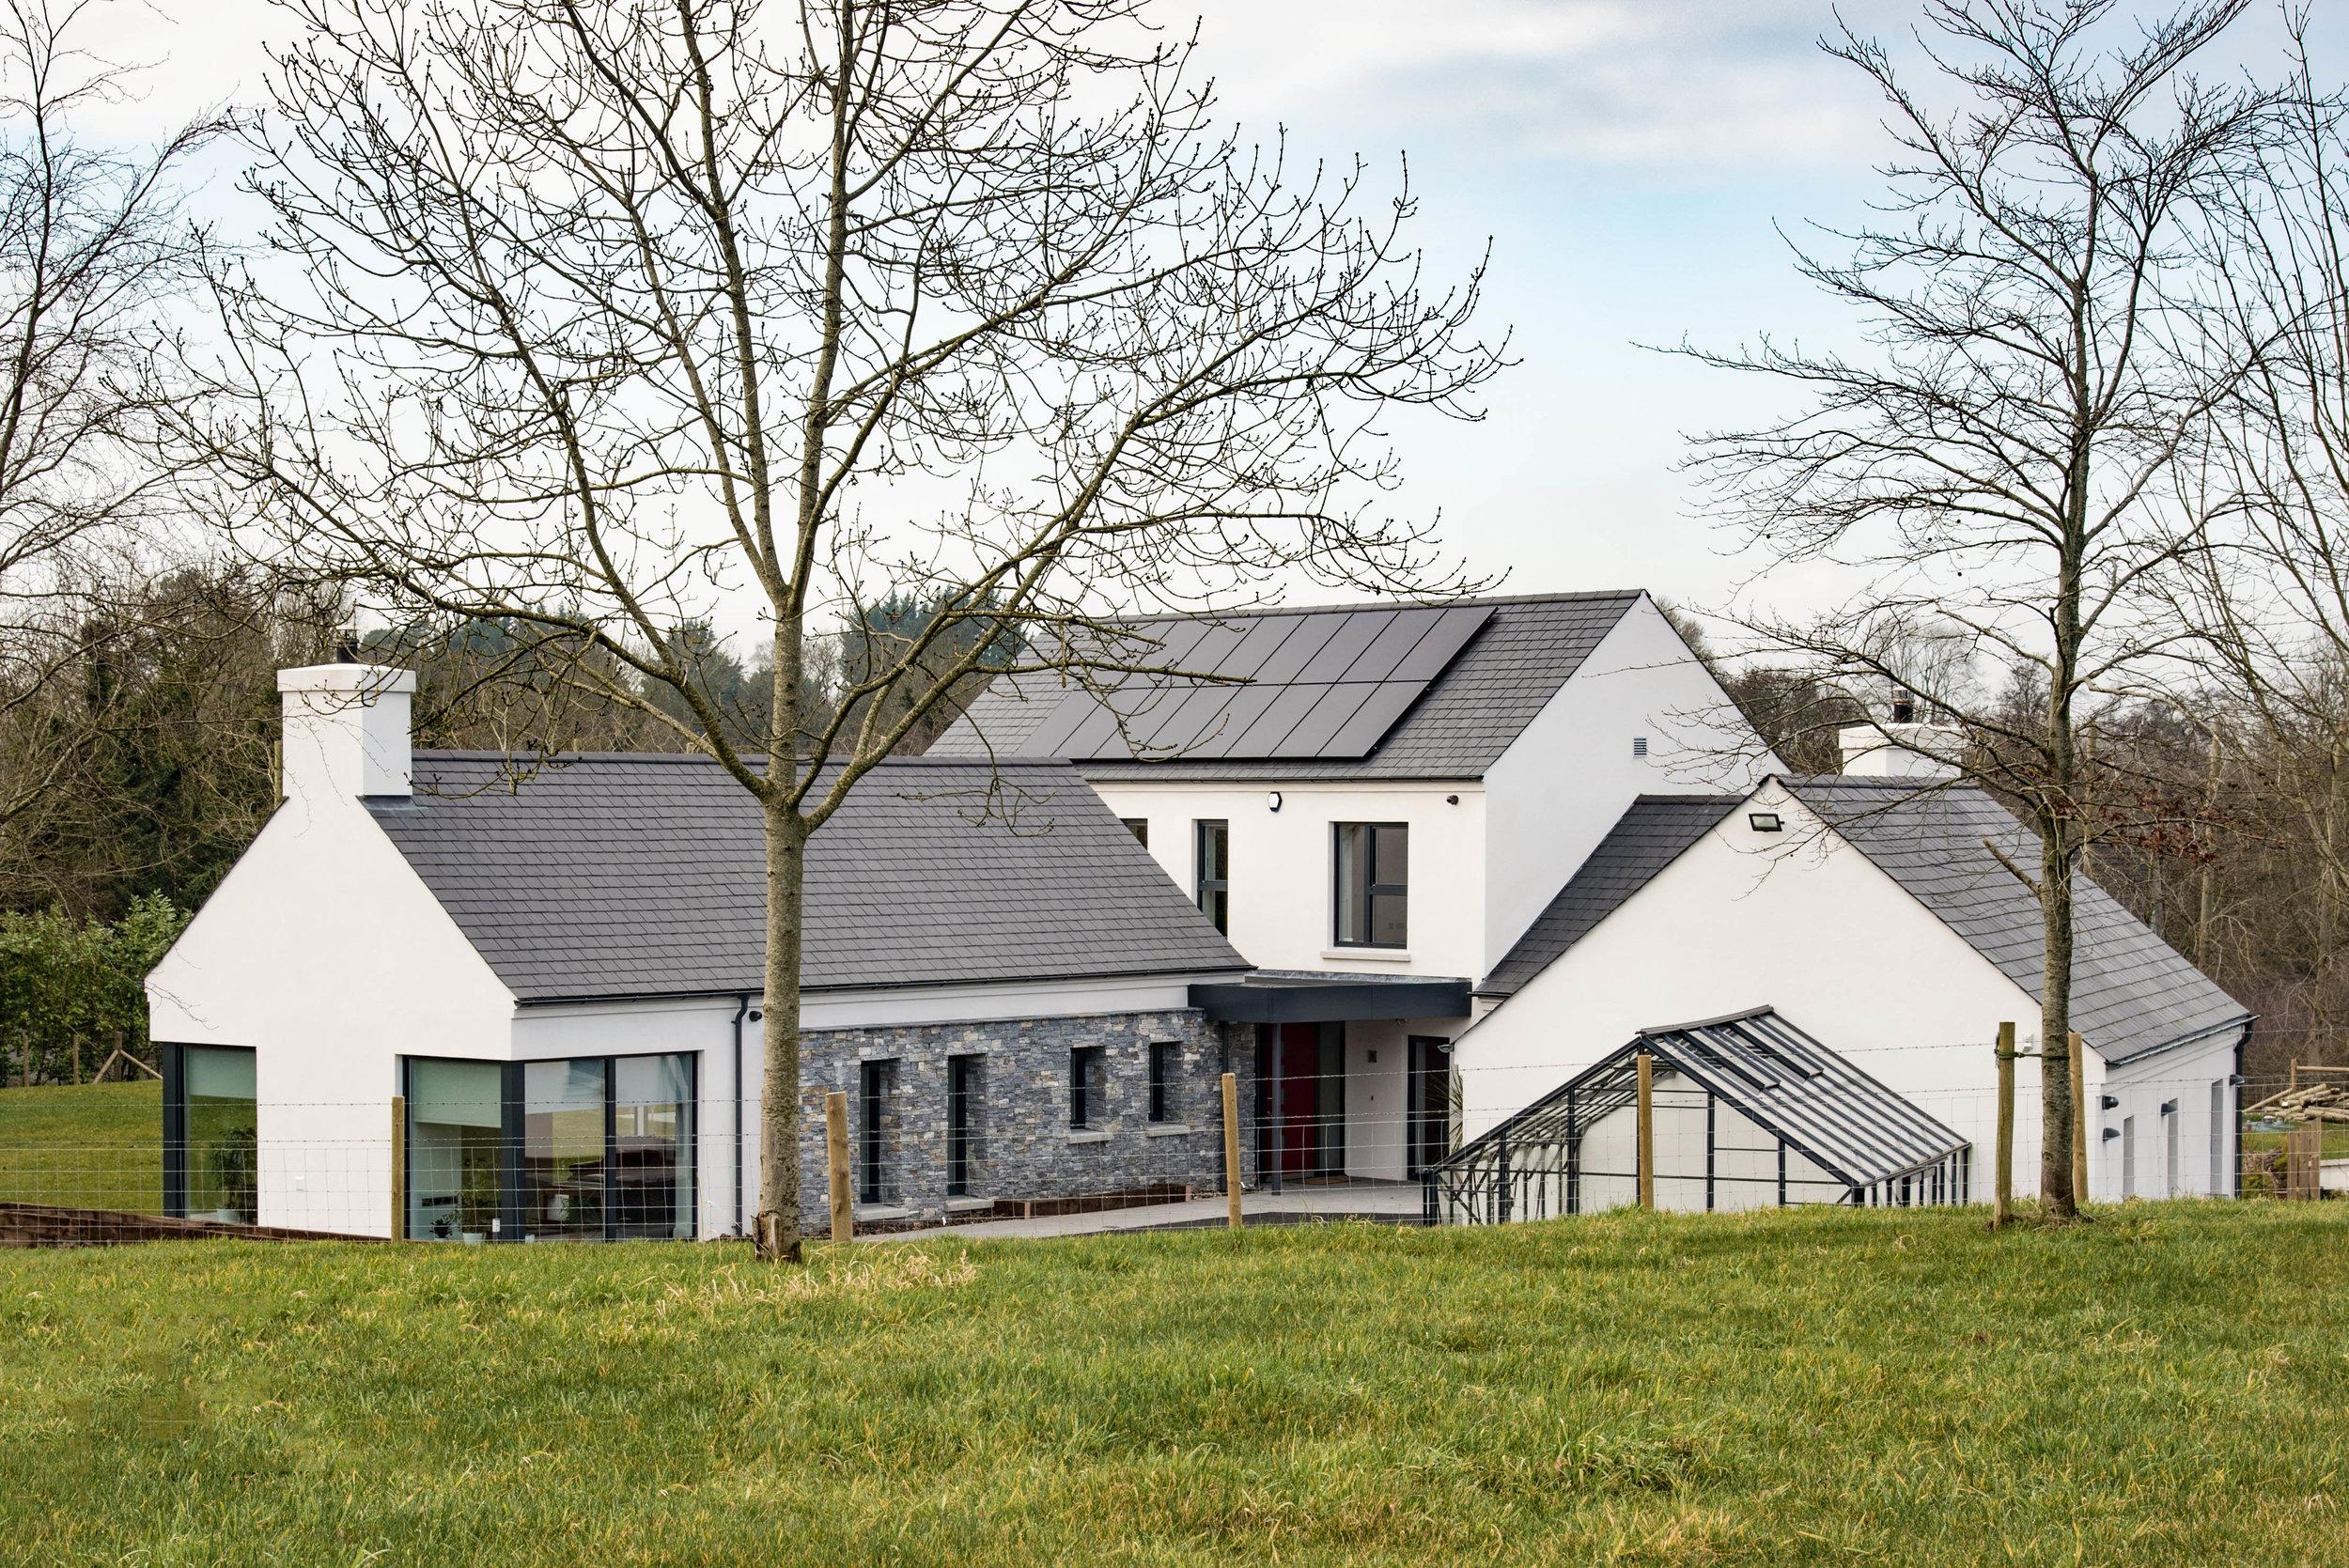 Paul_McAlister_Architects_Passive_House_Summerisland.jpg